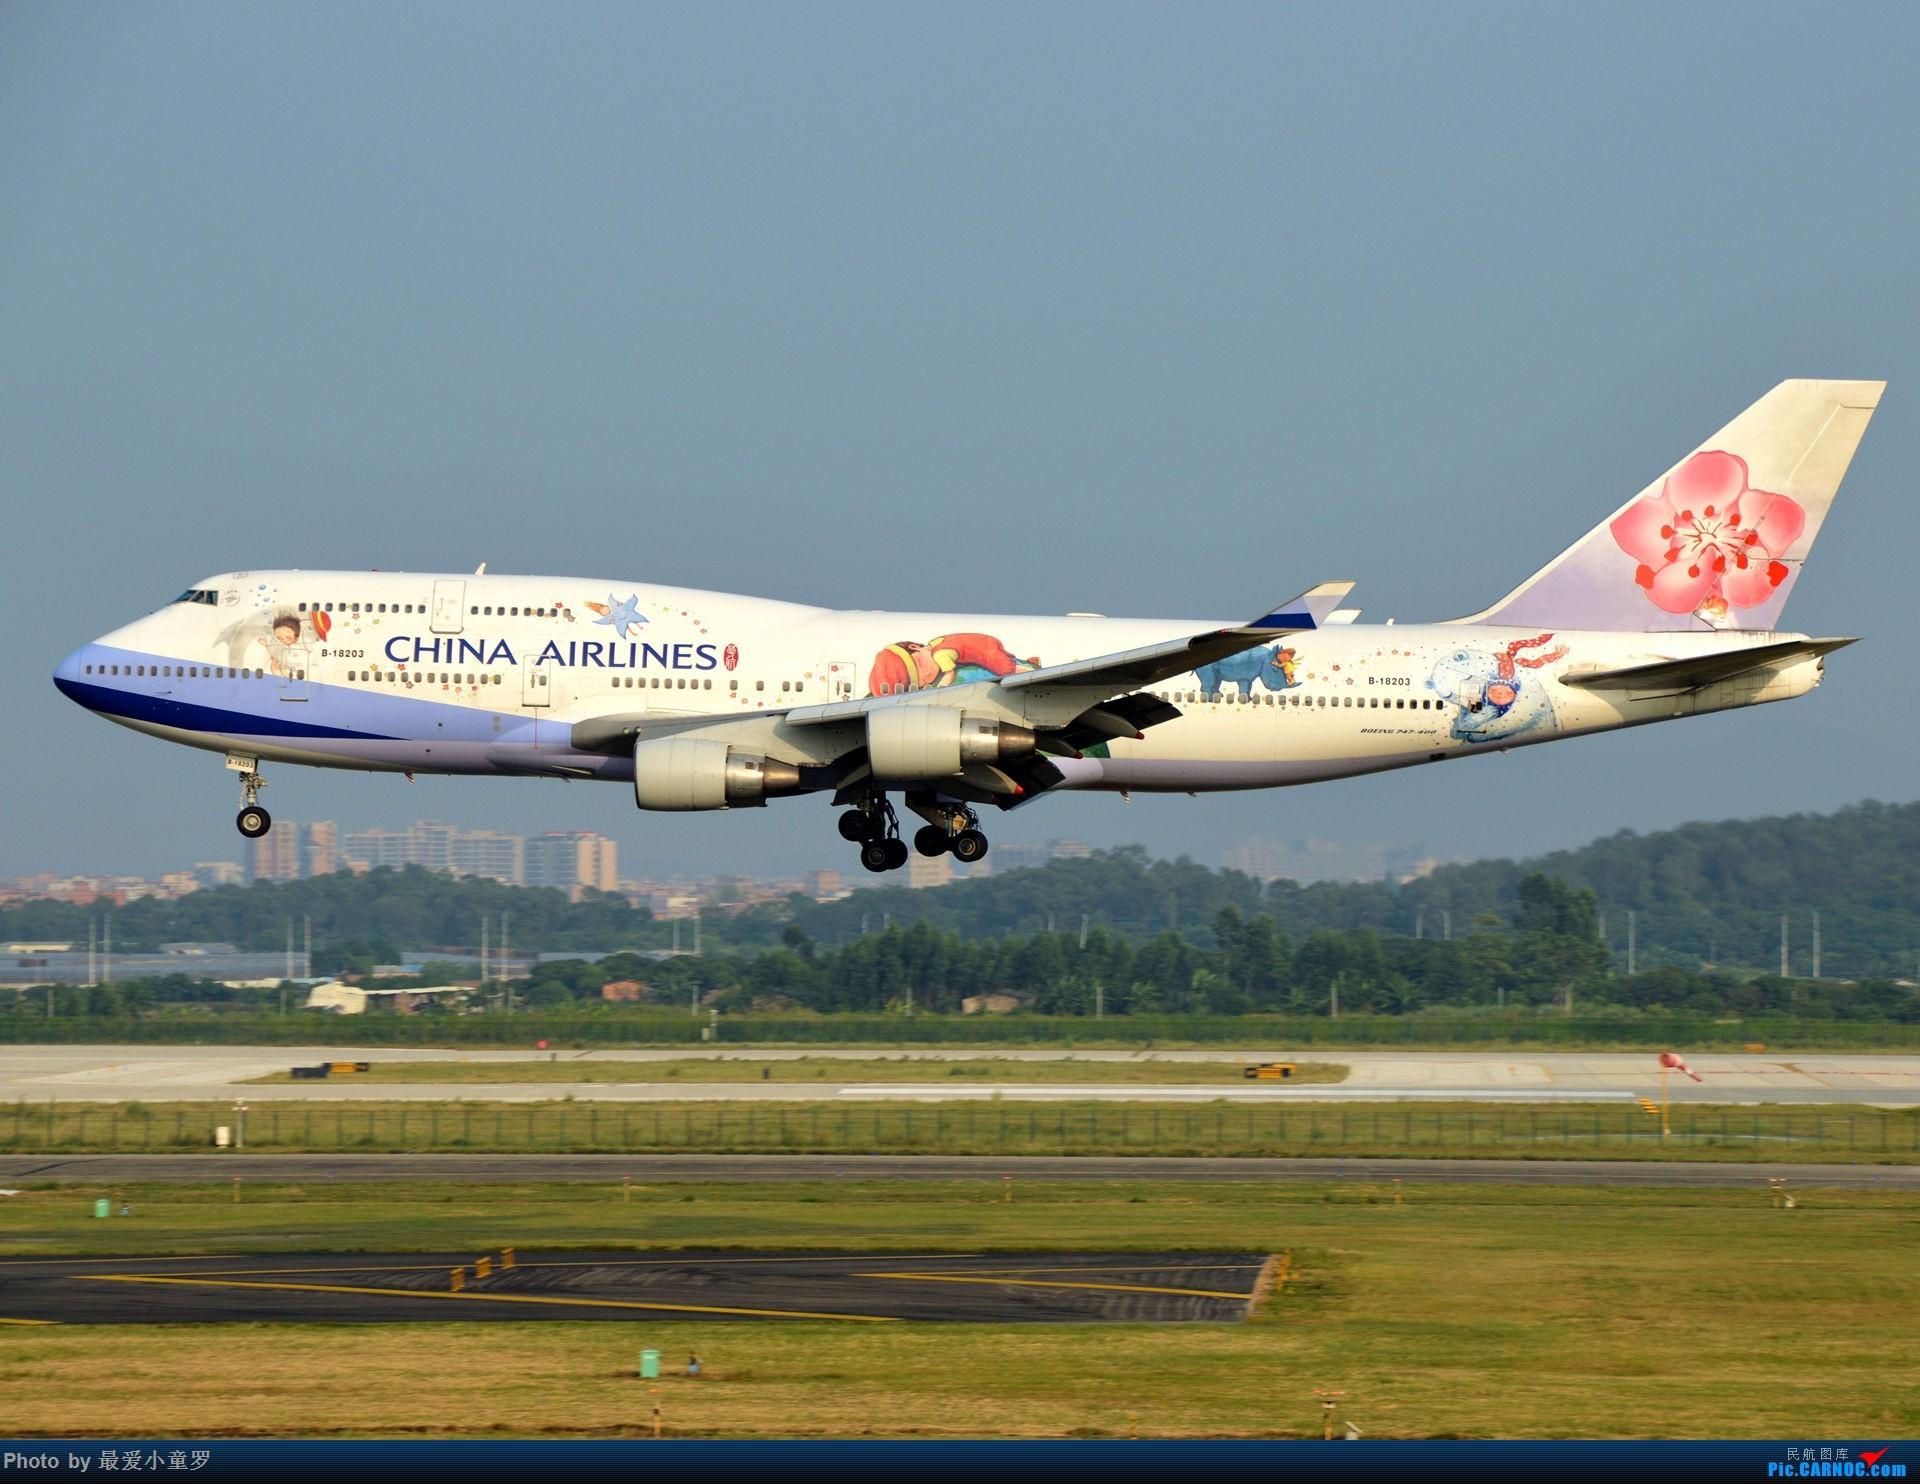 Re:[原创]旧的不去,新的不来——致2014远去的背影! BOEING 747-400 B-18203 中国广州白云国际机场